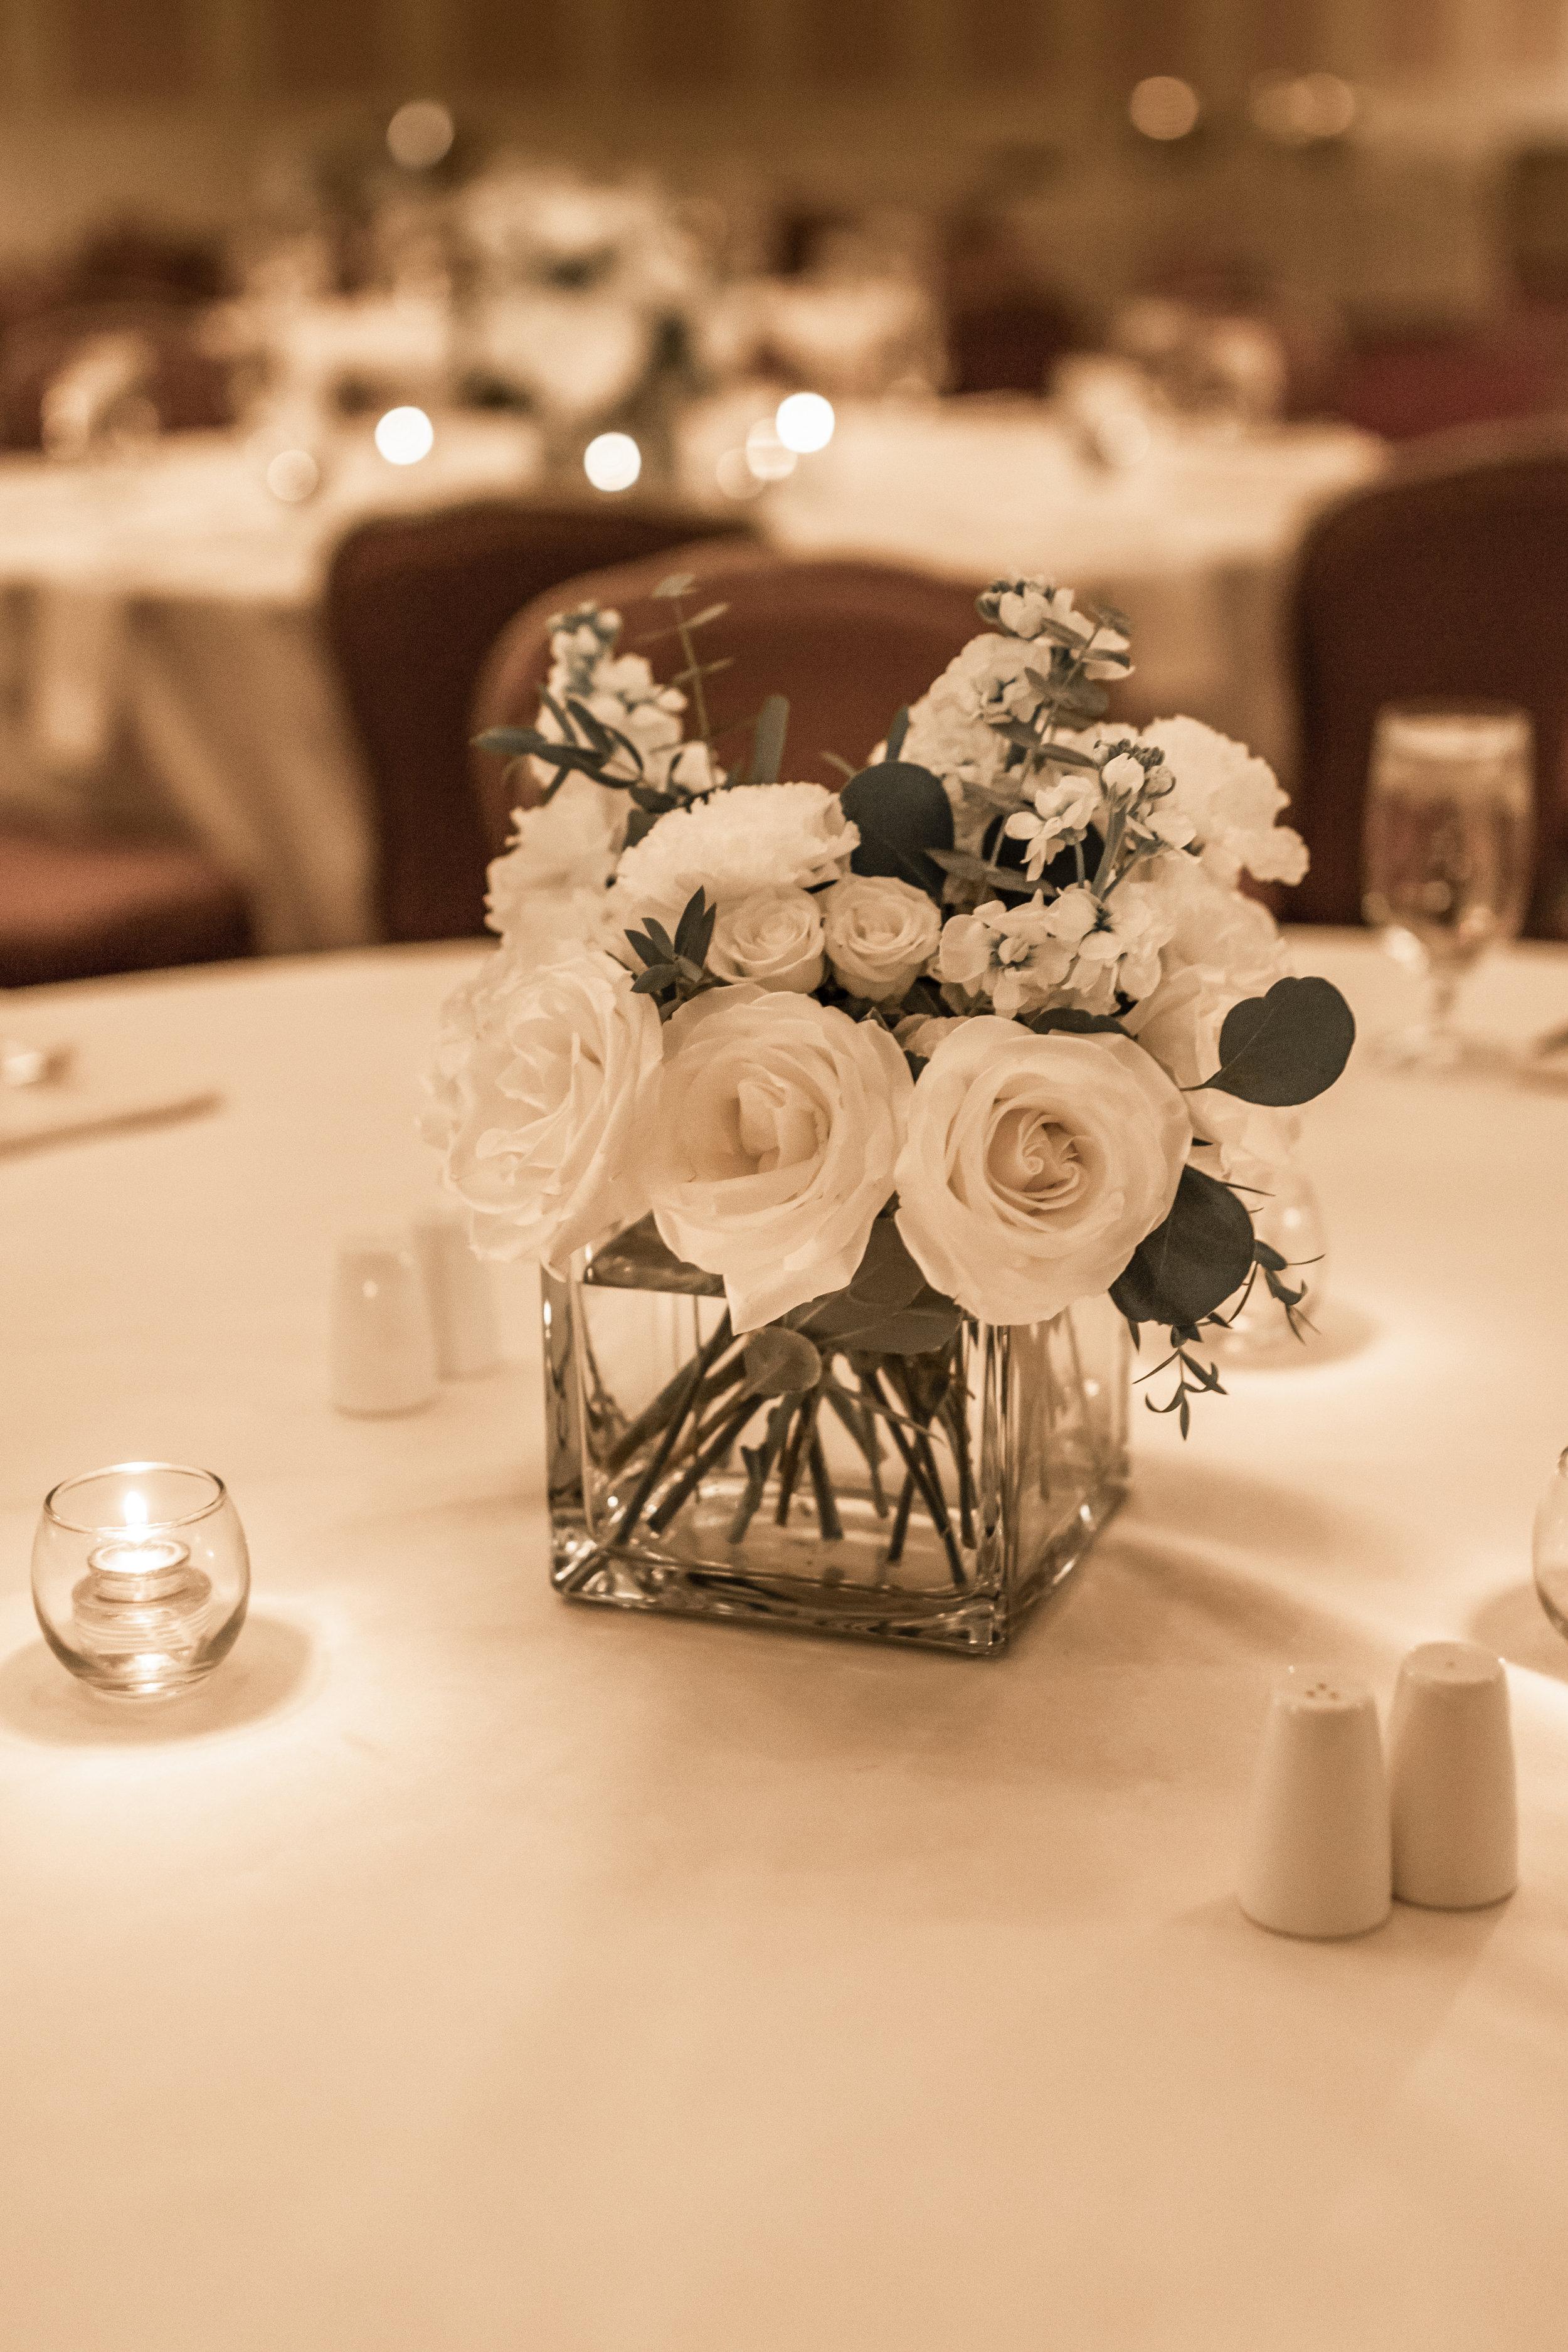 Grand America Hotel High End Wedding  Salt Lake City, Utah   Bri Bergman Photography 001.JPG